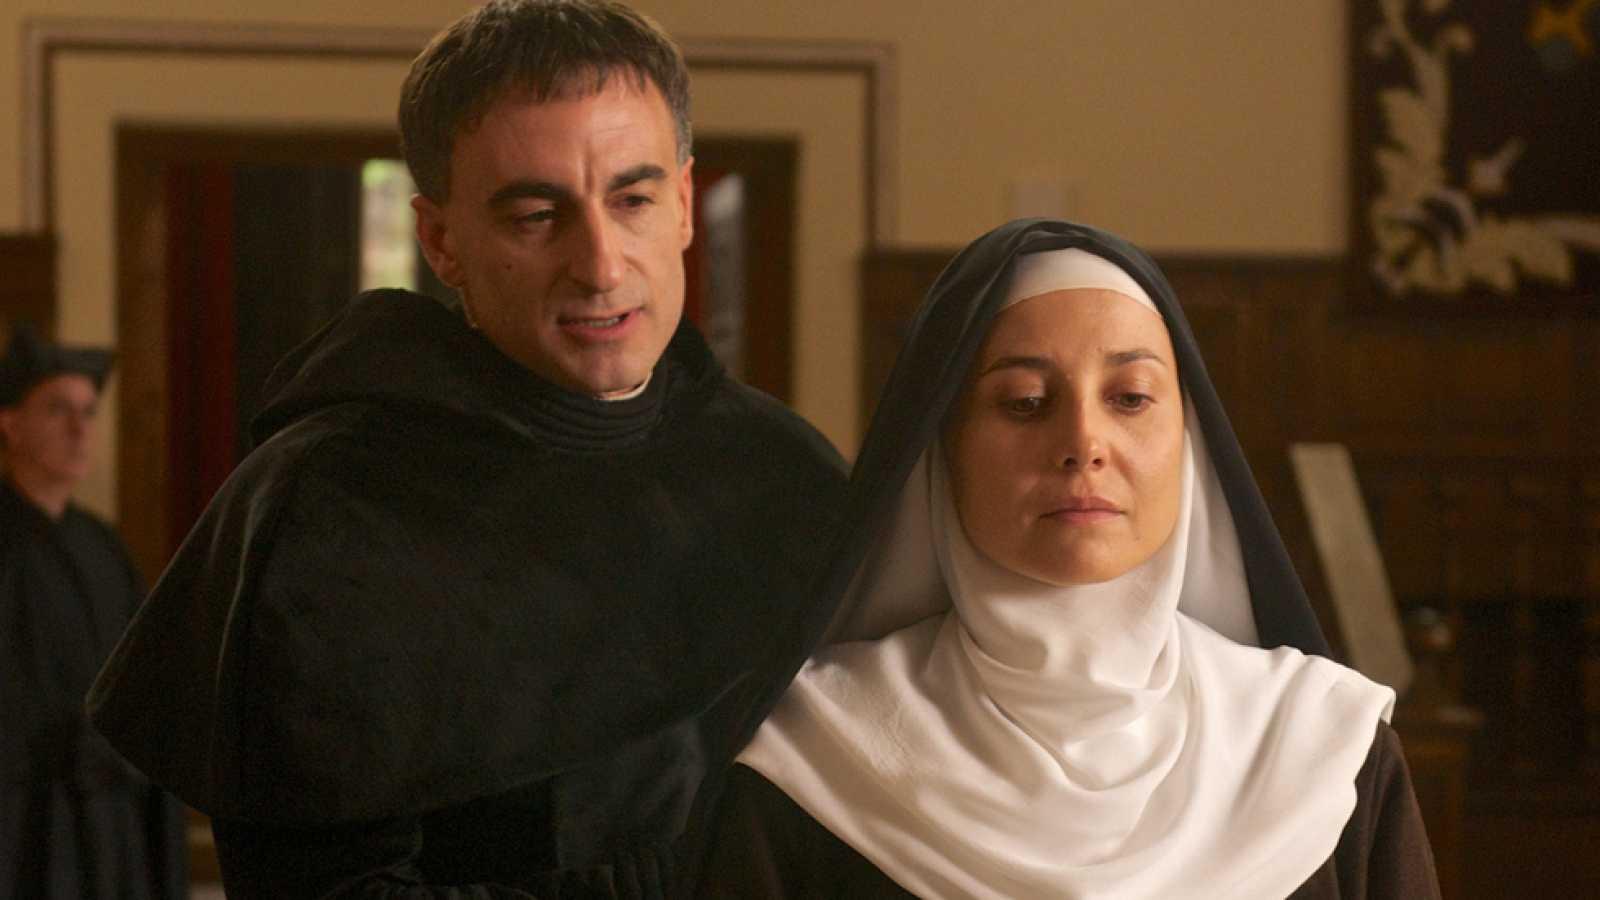 Teresa- 'Teresa', estreno el martes 17 de noviembre a las 22:15 en La 1